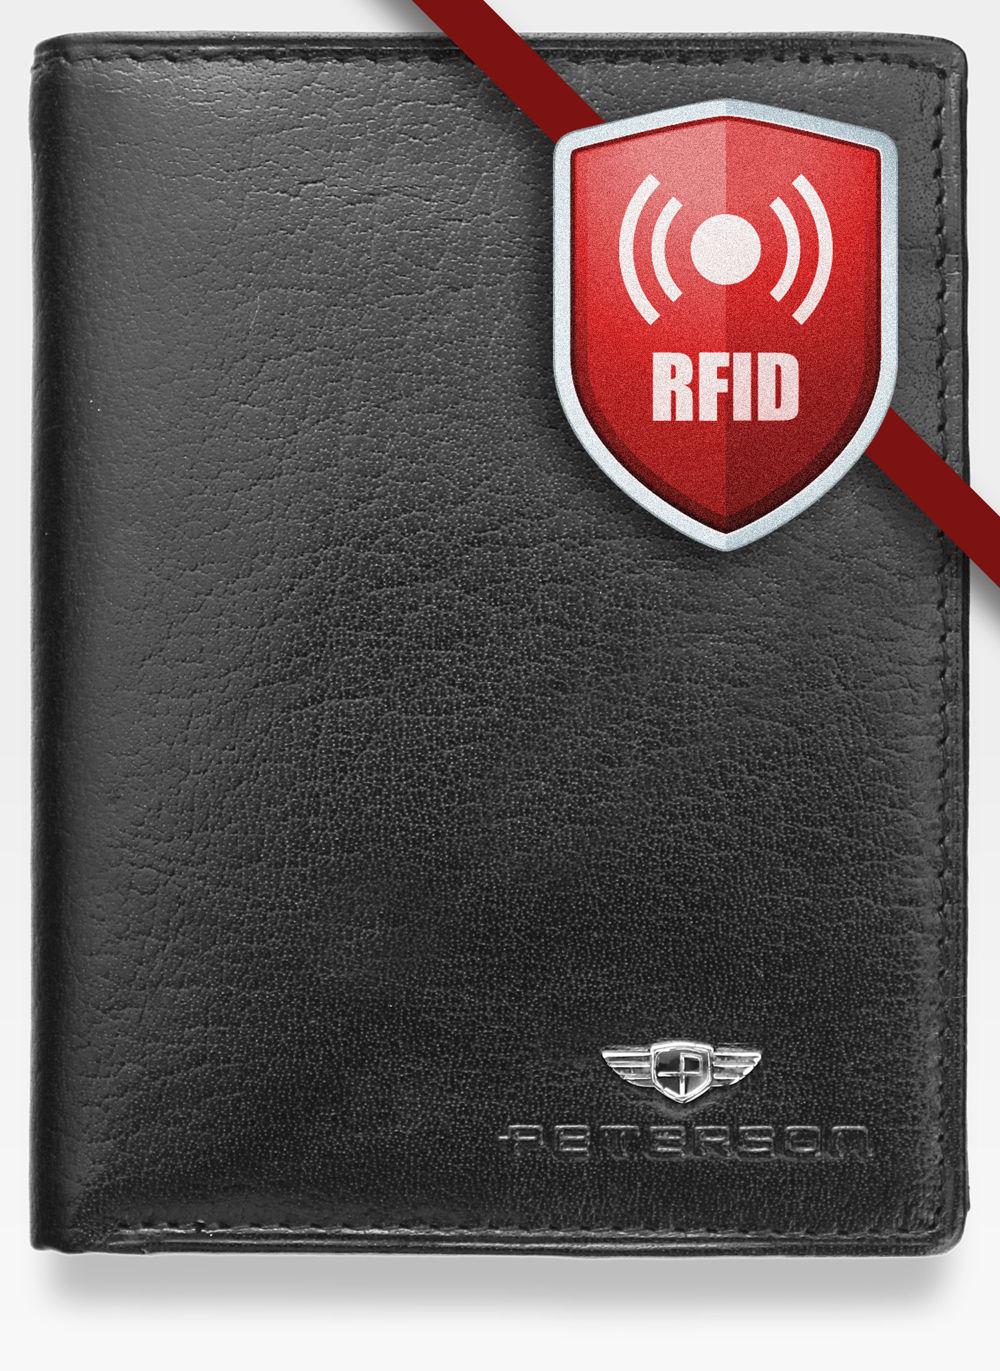 d795380be6cd1 Portfel Męski Peterson Skórzany Czarny 350 RFID STOP 350 2-1-1 RFID ...